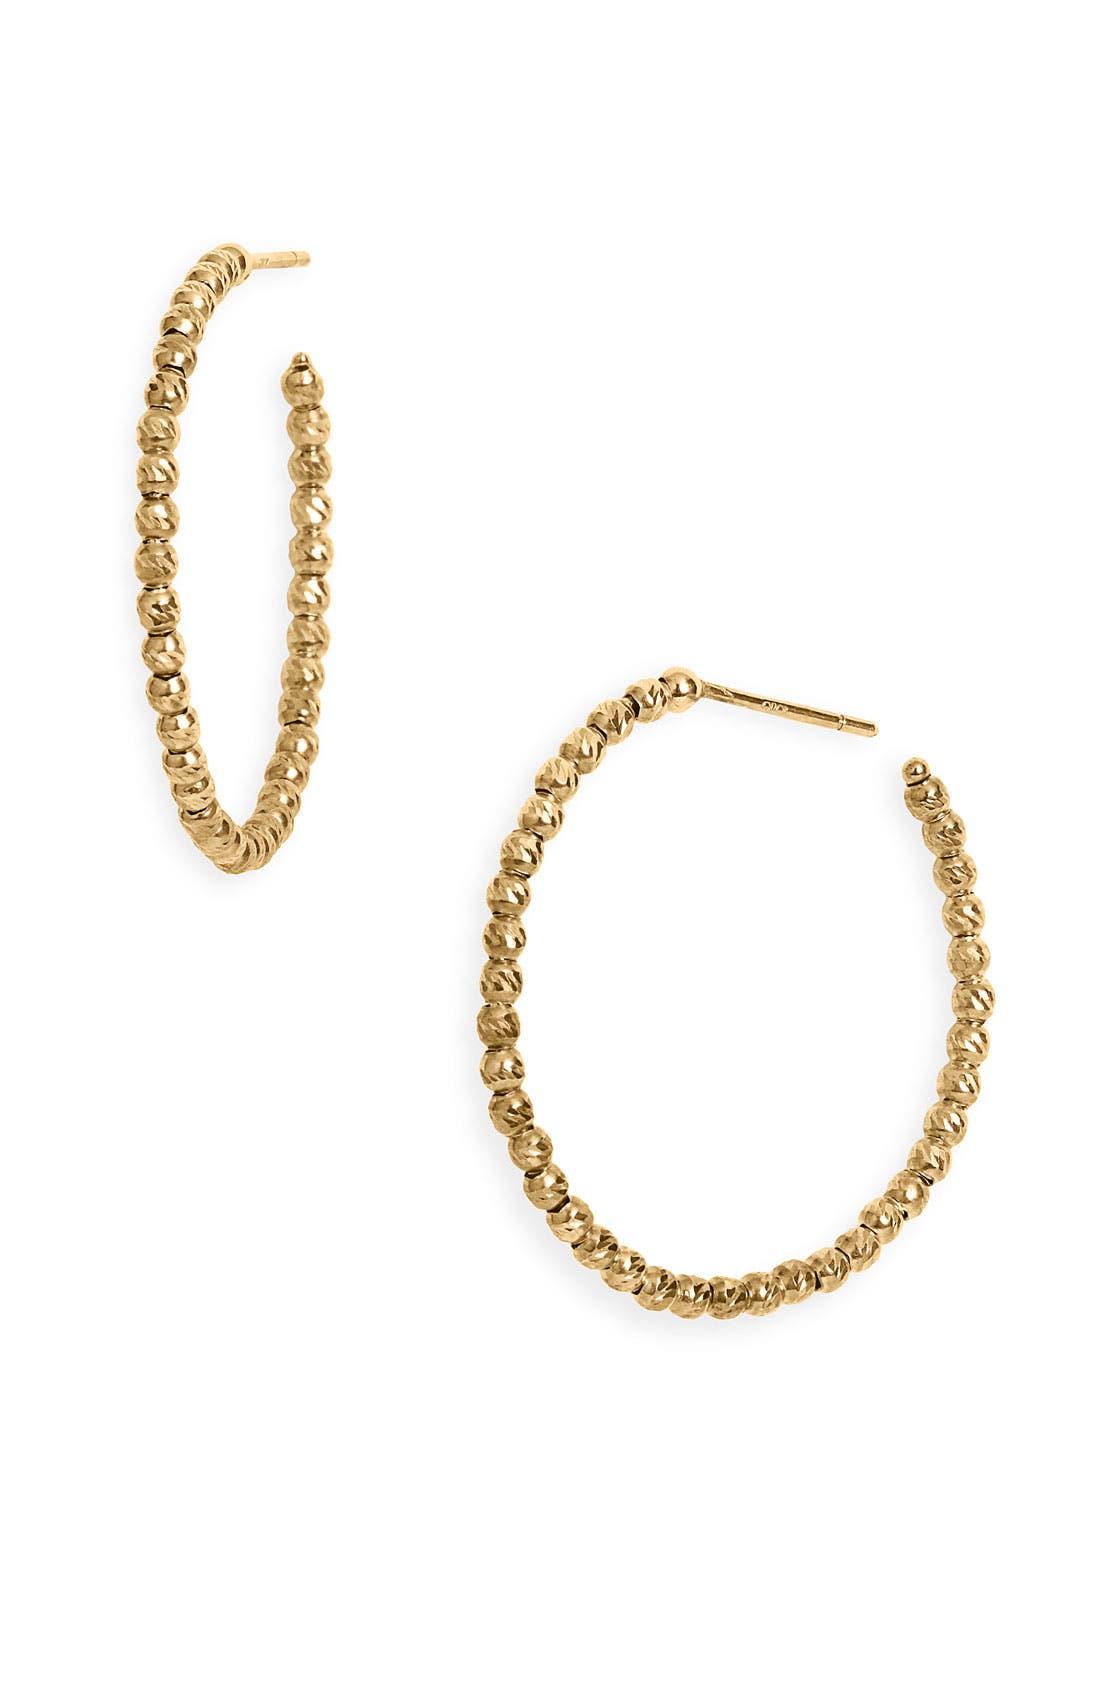 Main Image - Lana Jewelry 'Small Olivia' Bead Earrings